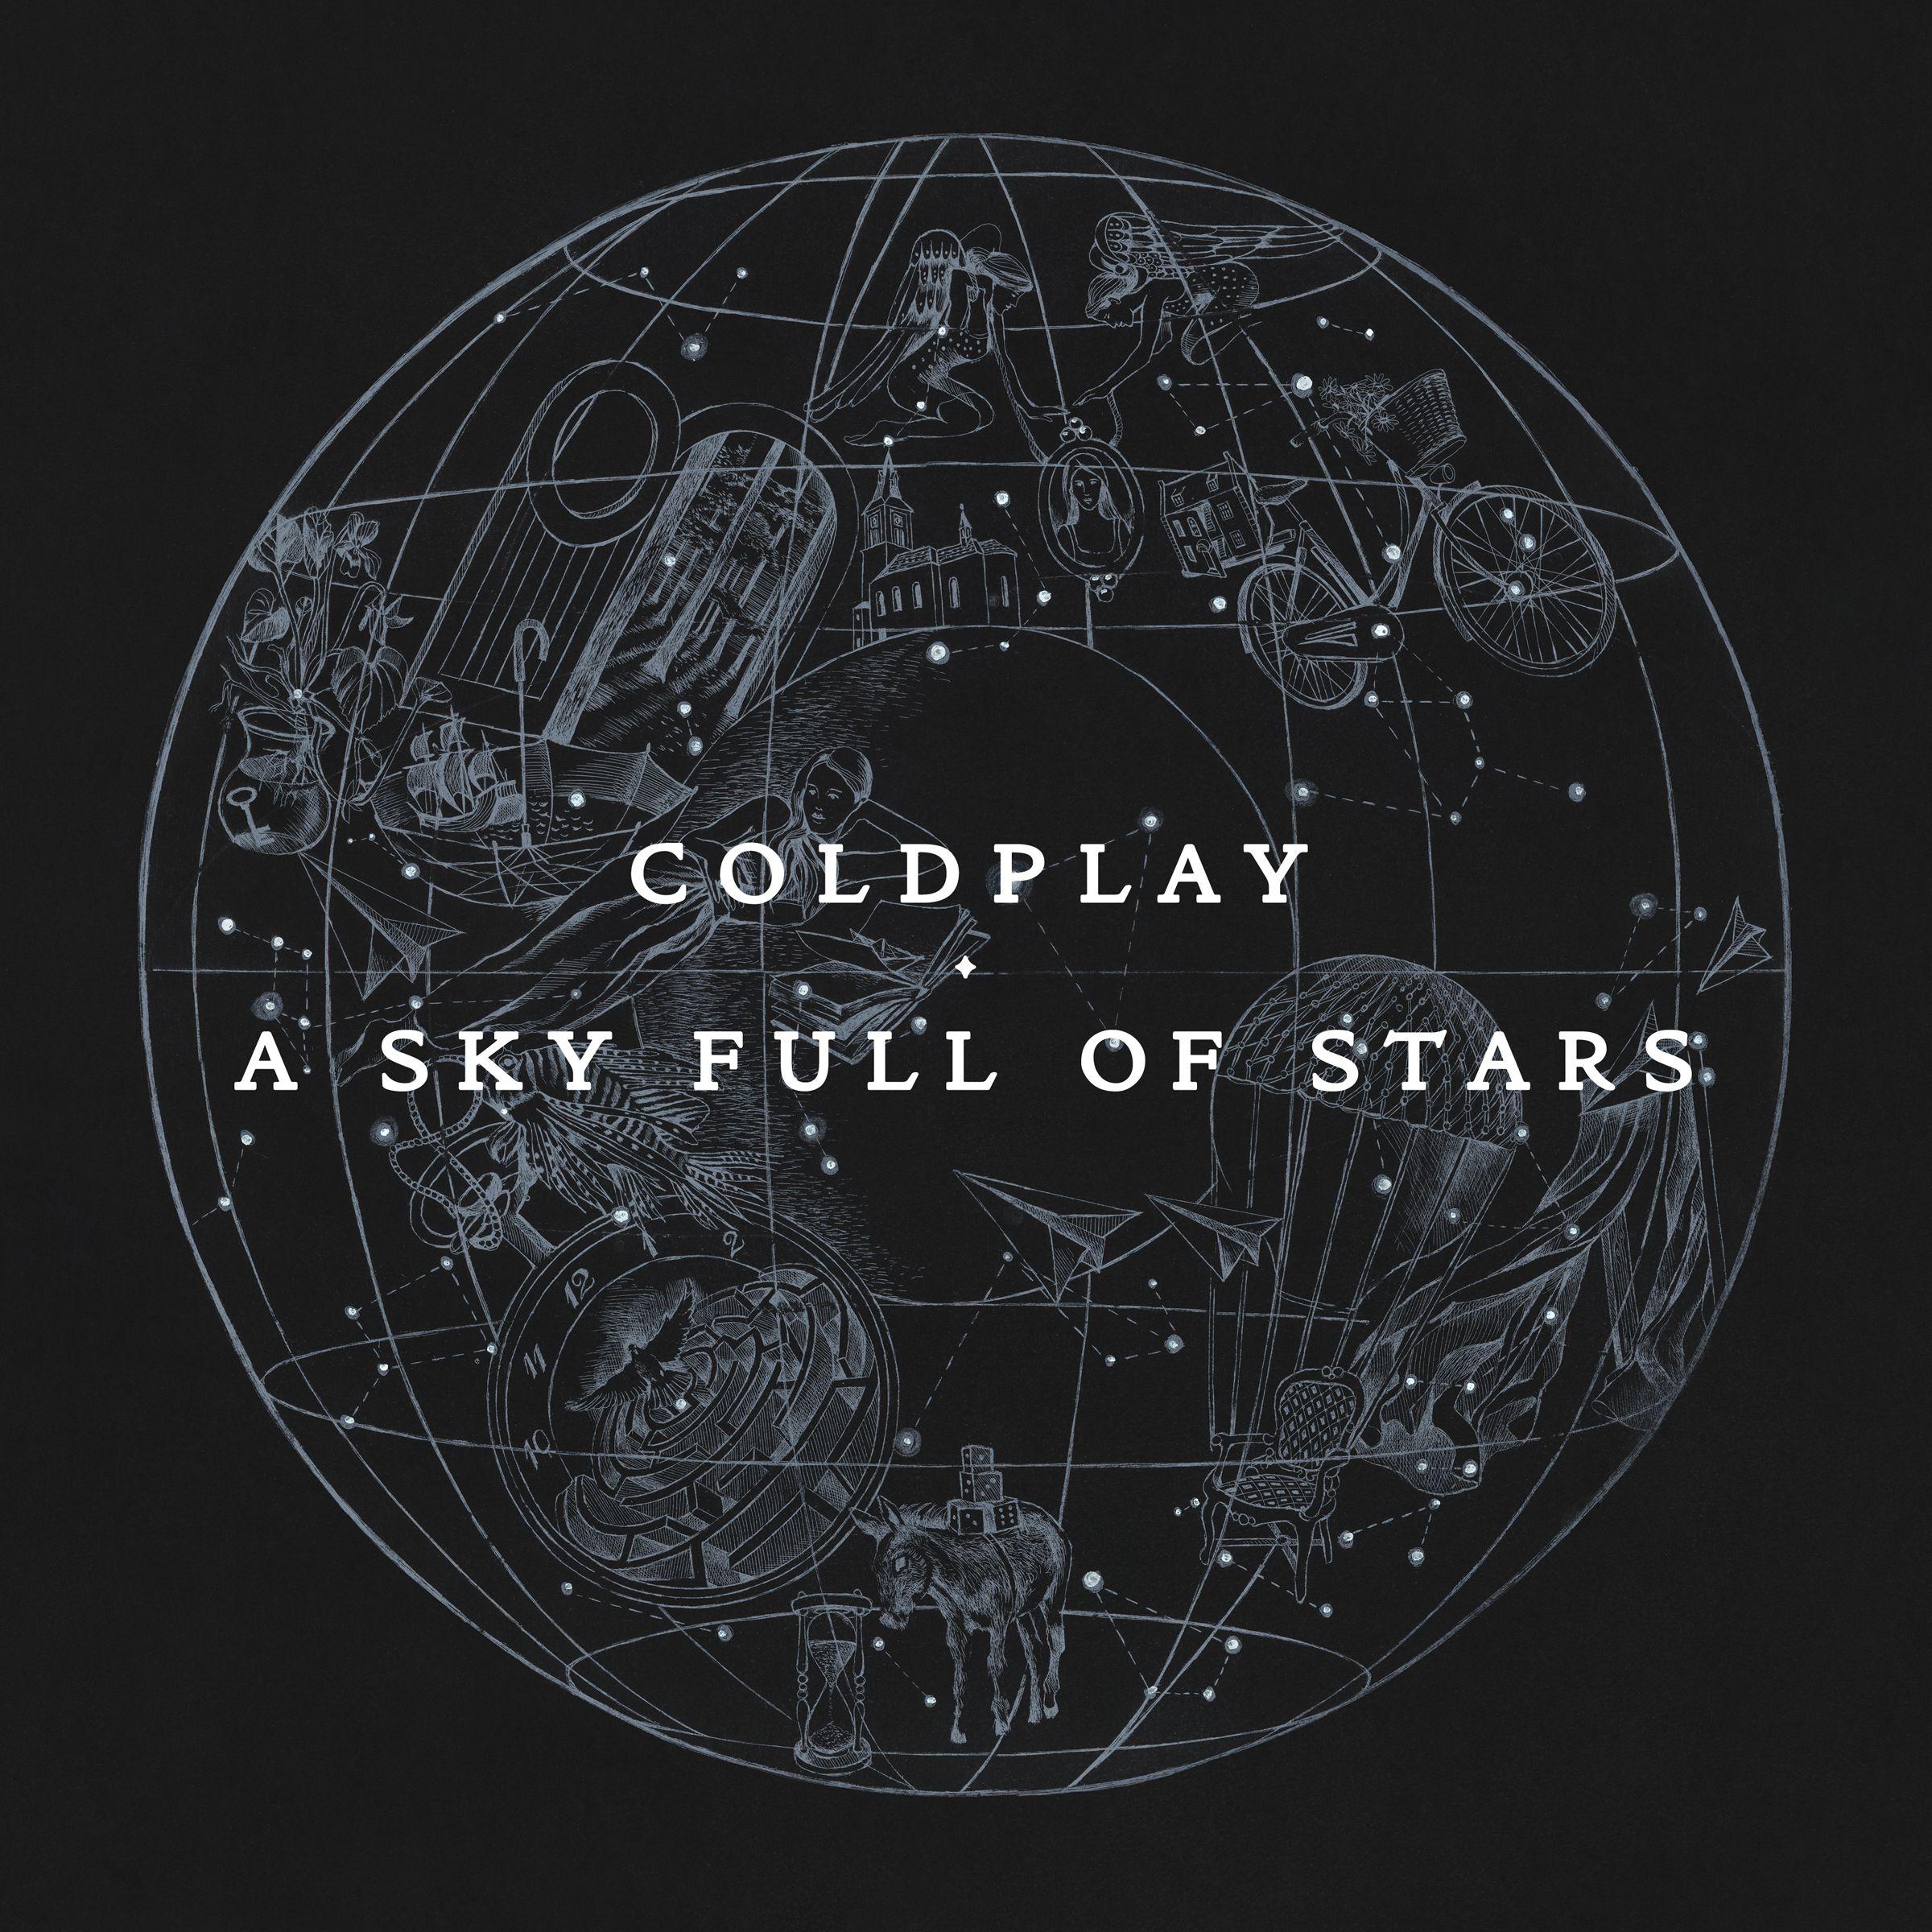 Uncategorized Sky Full Of Stars Coldplay listen free to coldplay a sky full of stars radio iheartradio